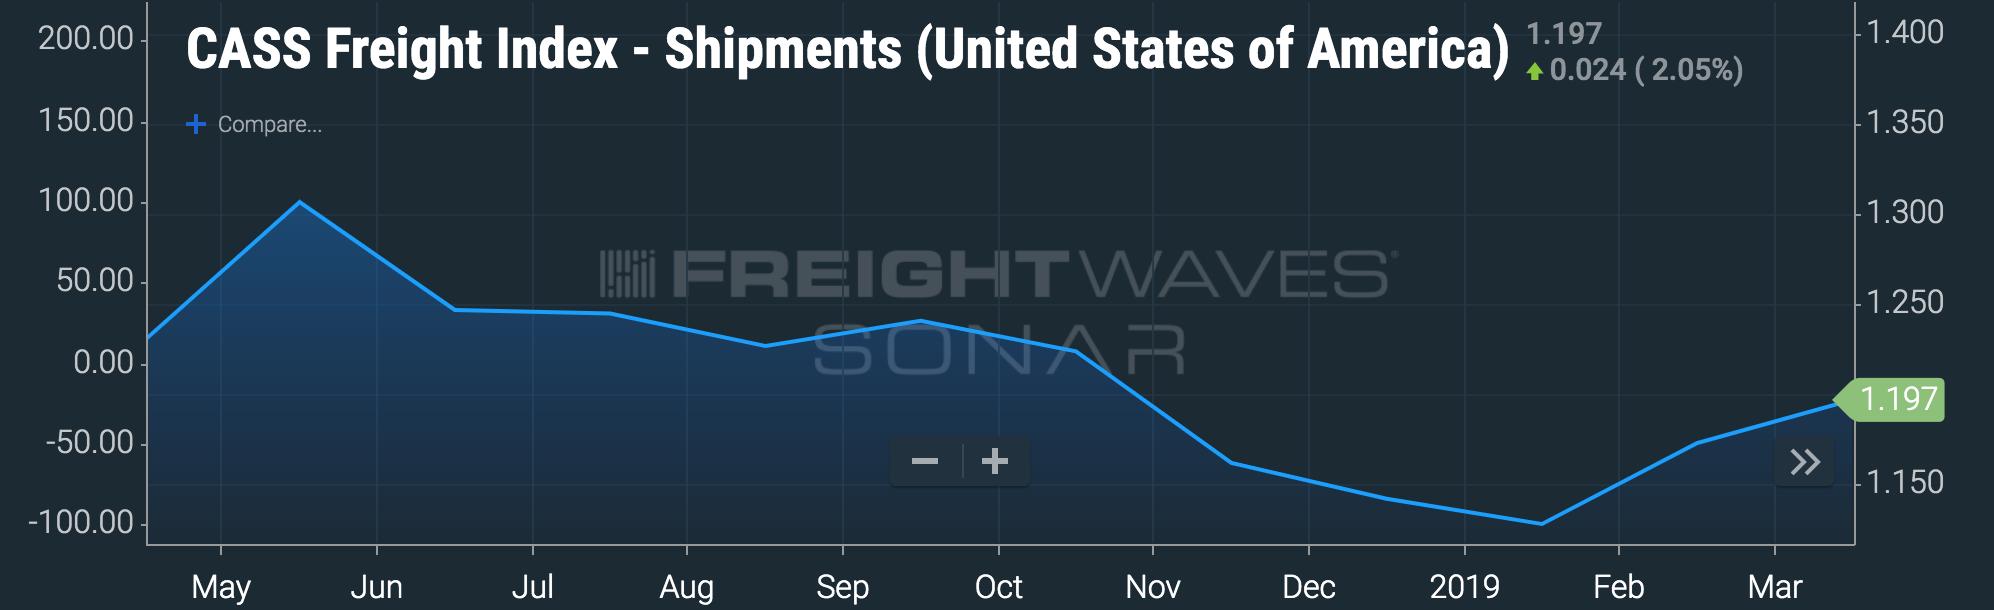 Image: FreightWaves' SONAR featuring Cass Freight Index data